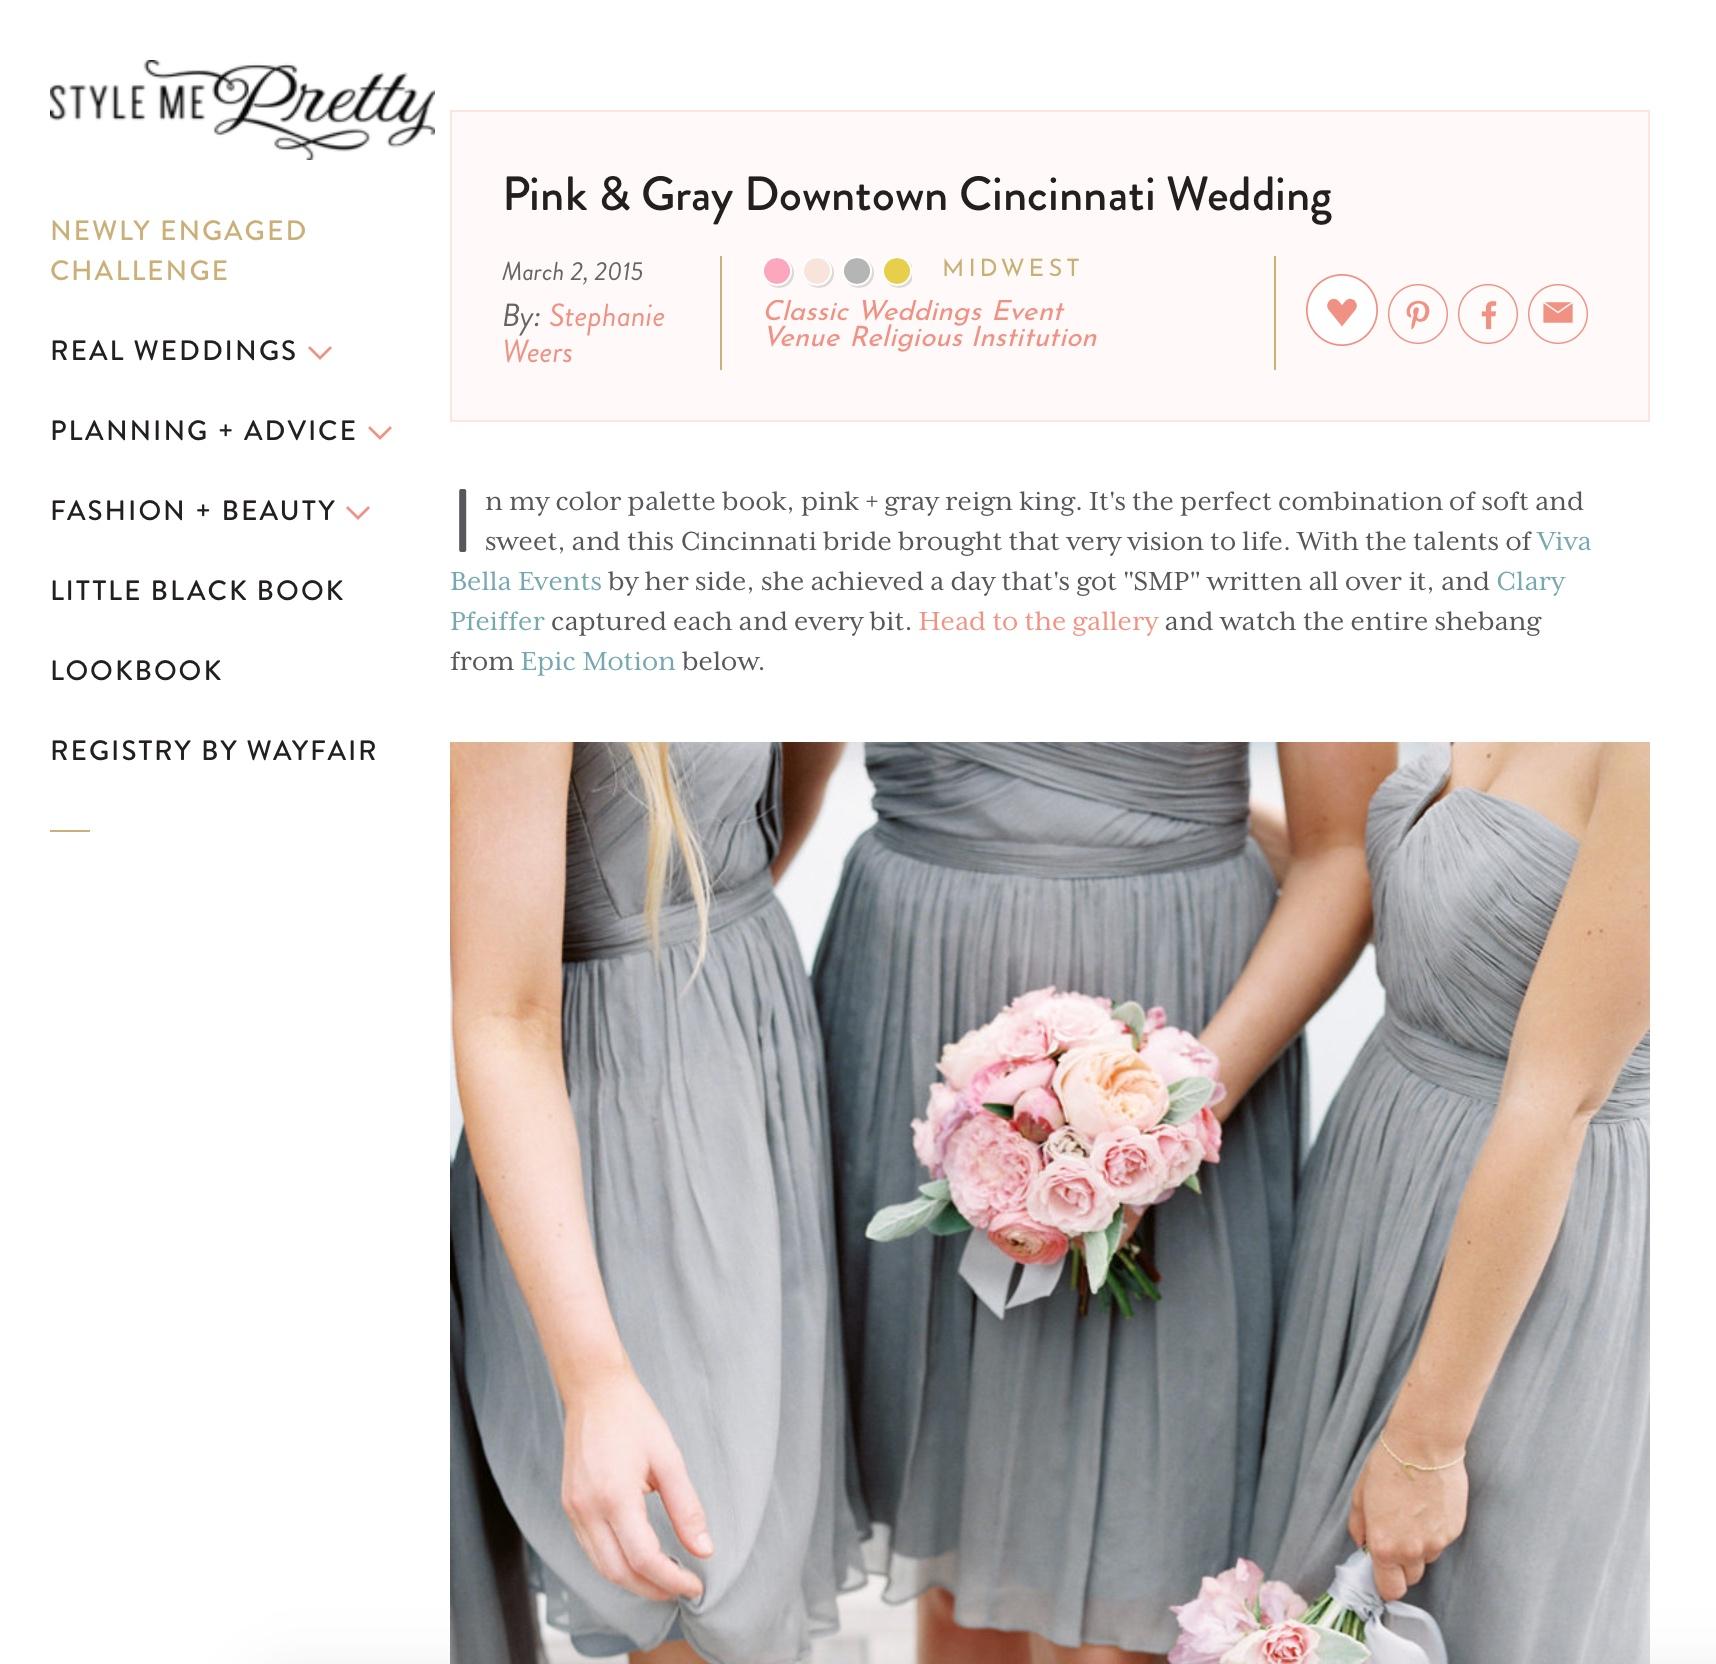 Pink & Gray Downtown Cincinnati Wedding